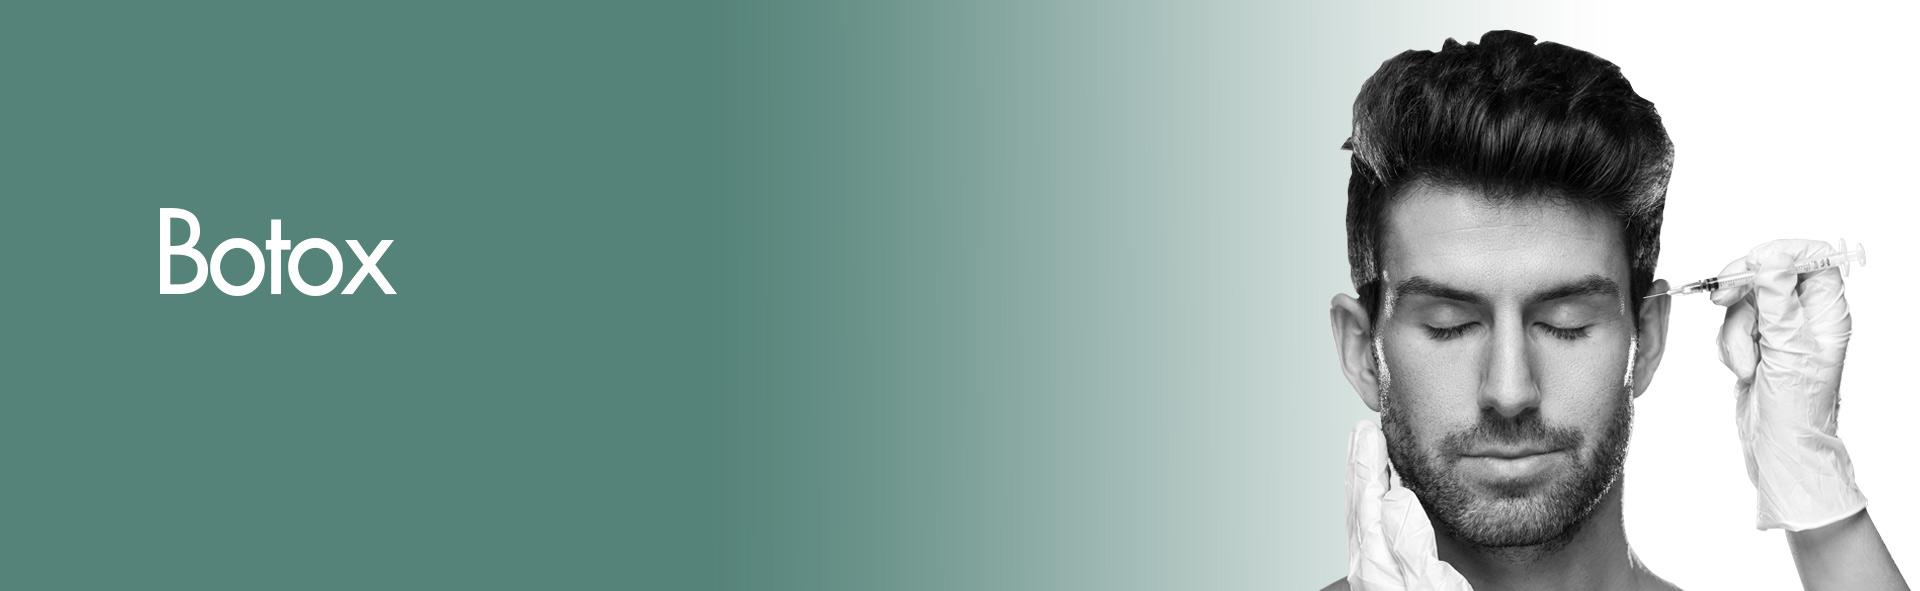 banner toxina botulínica male